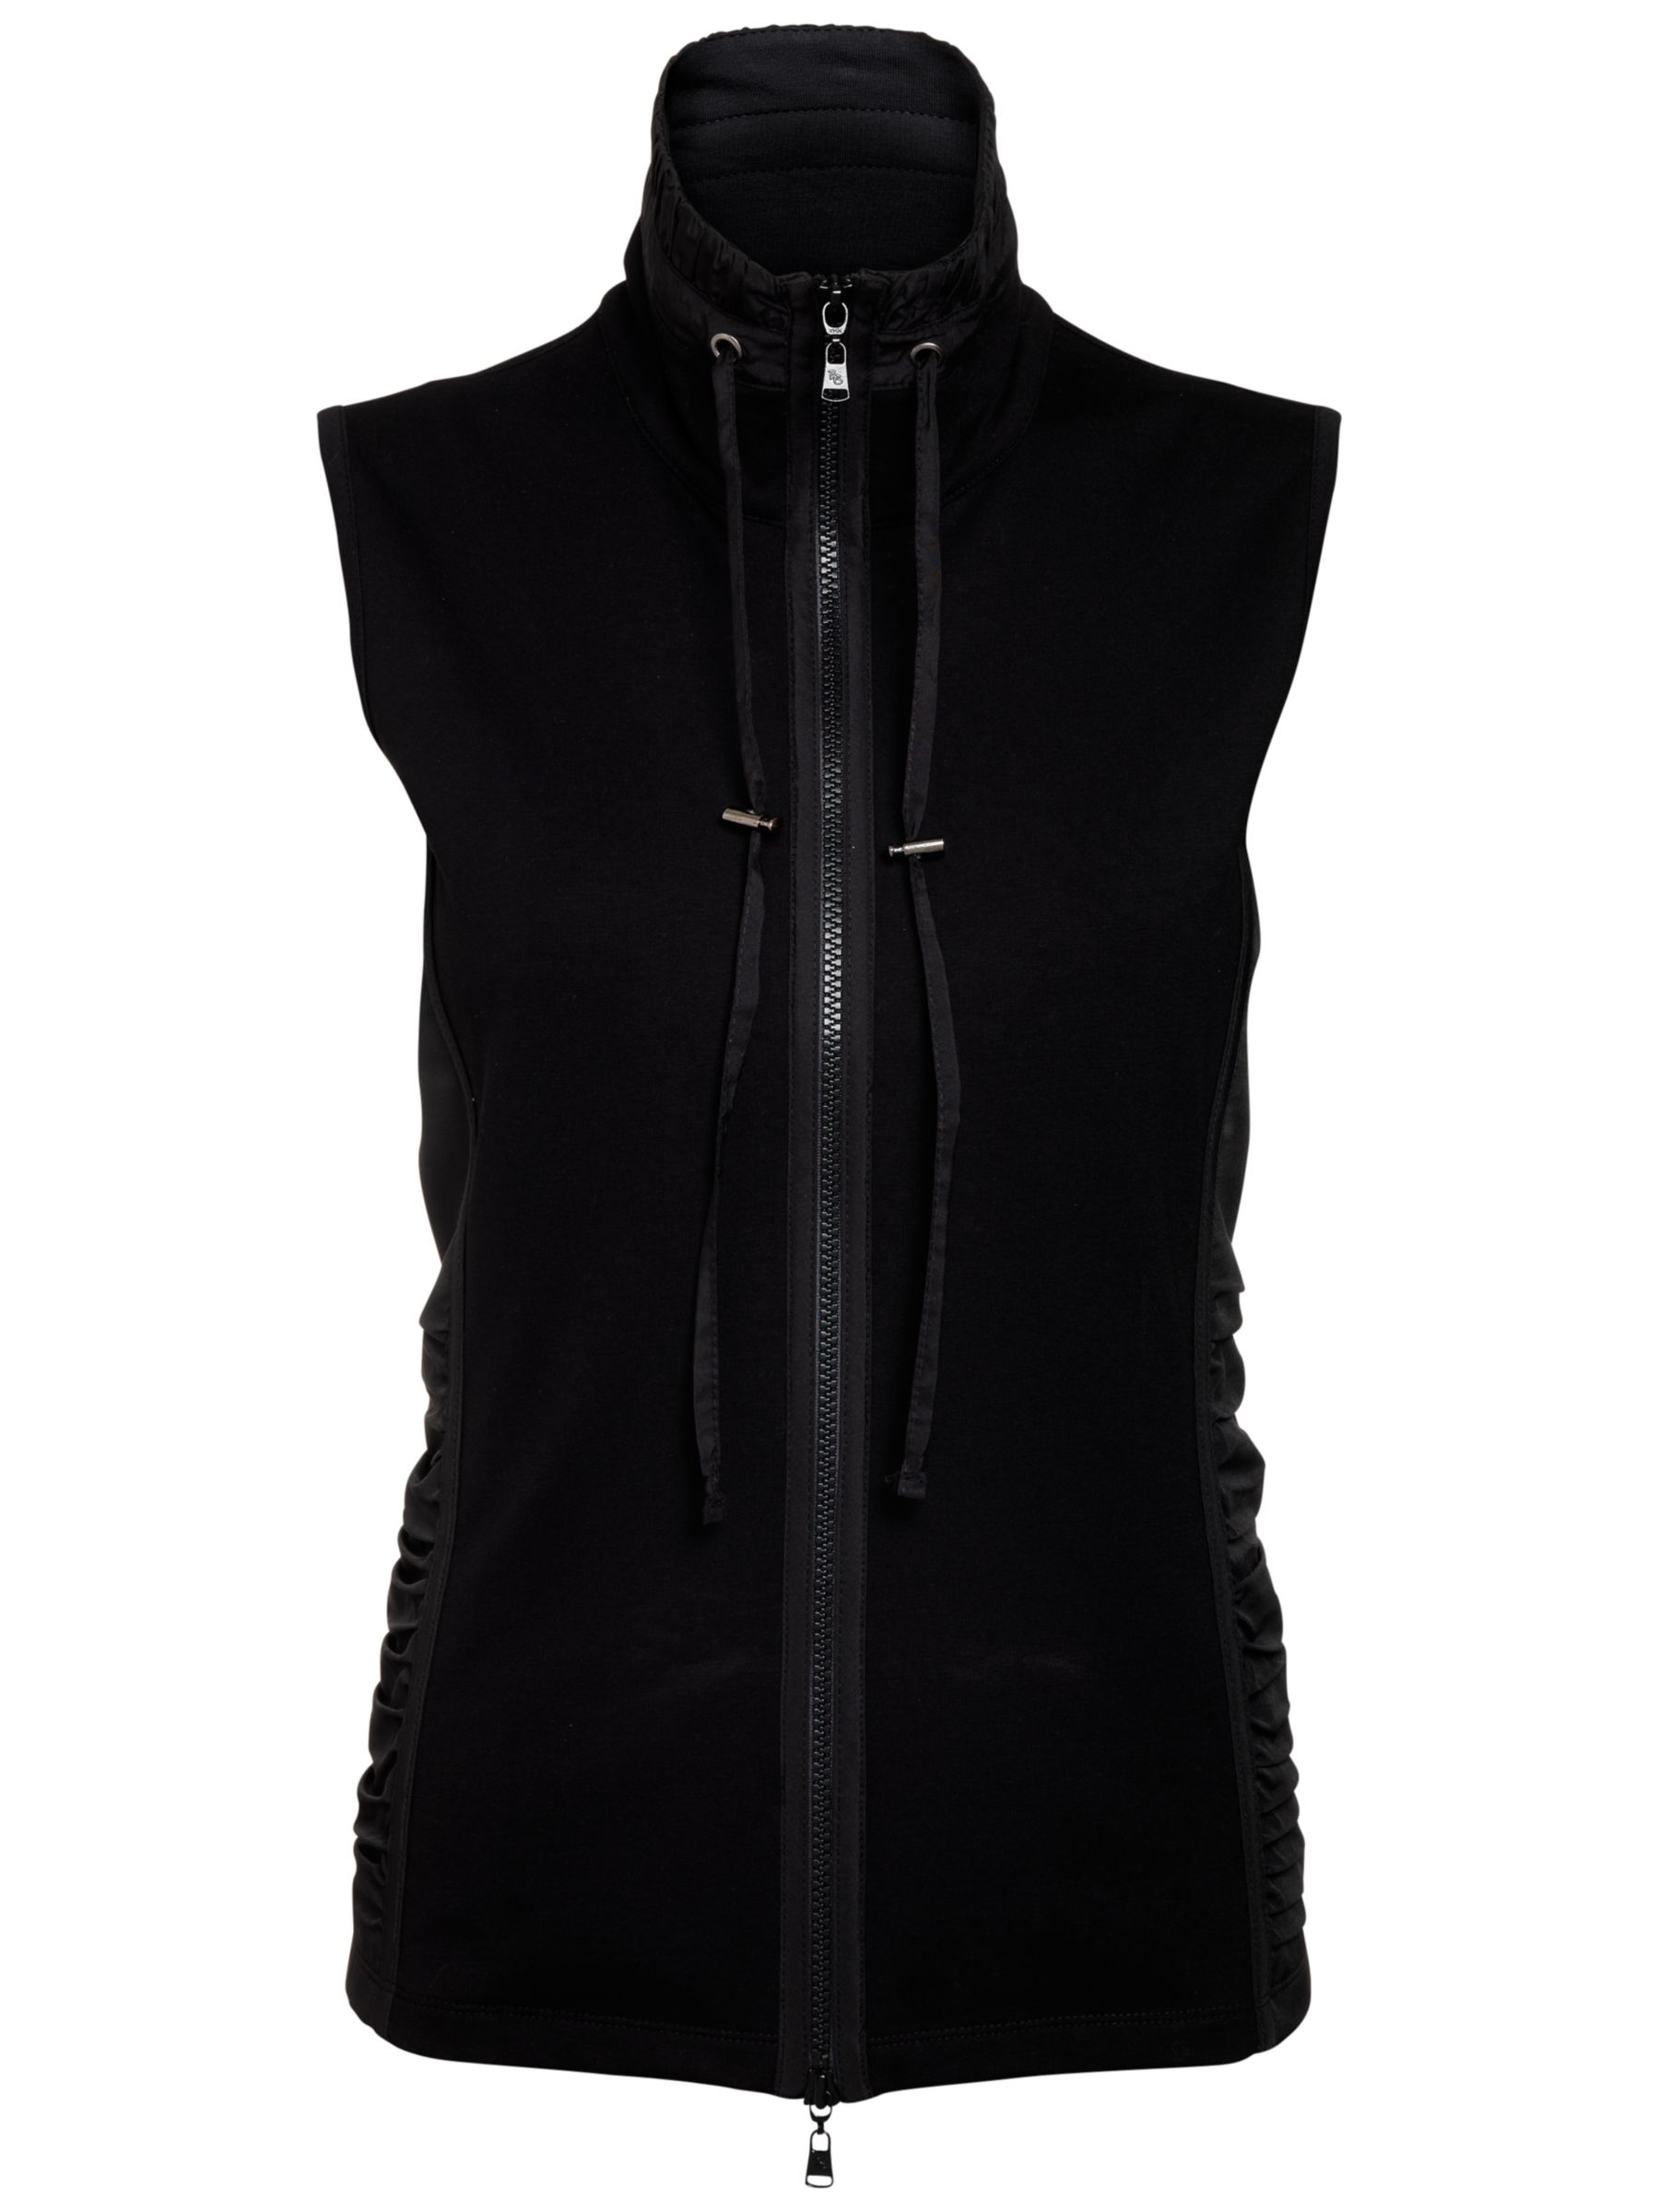 Betty Barclay Zip Front Gilet Jacket